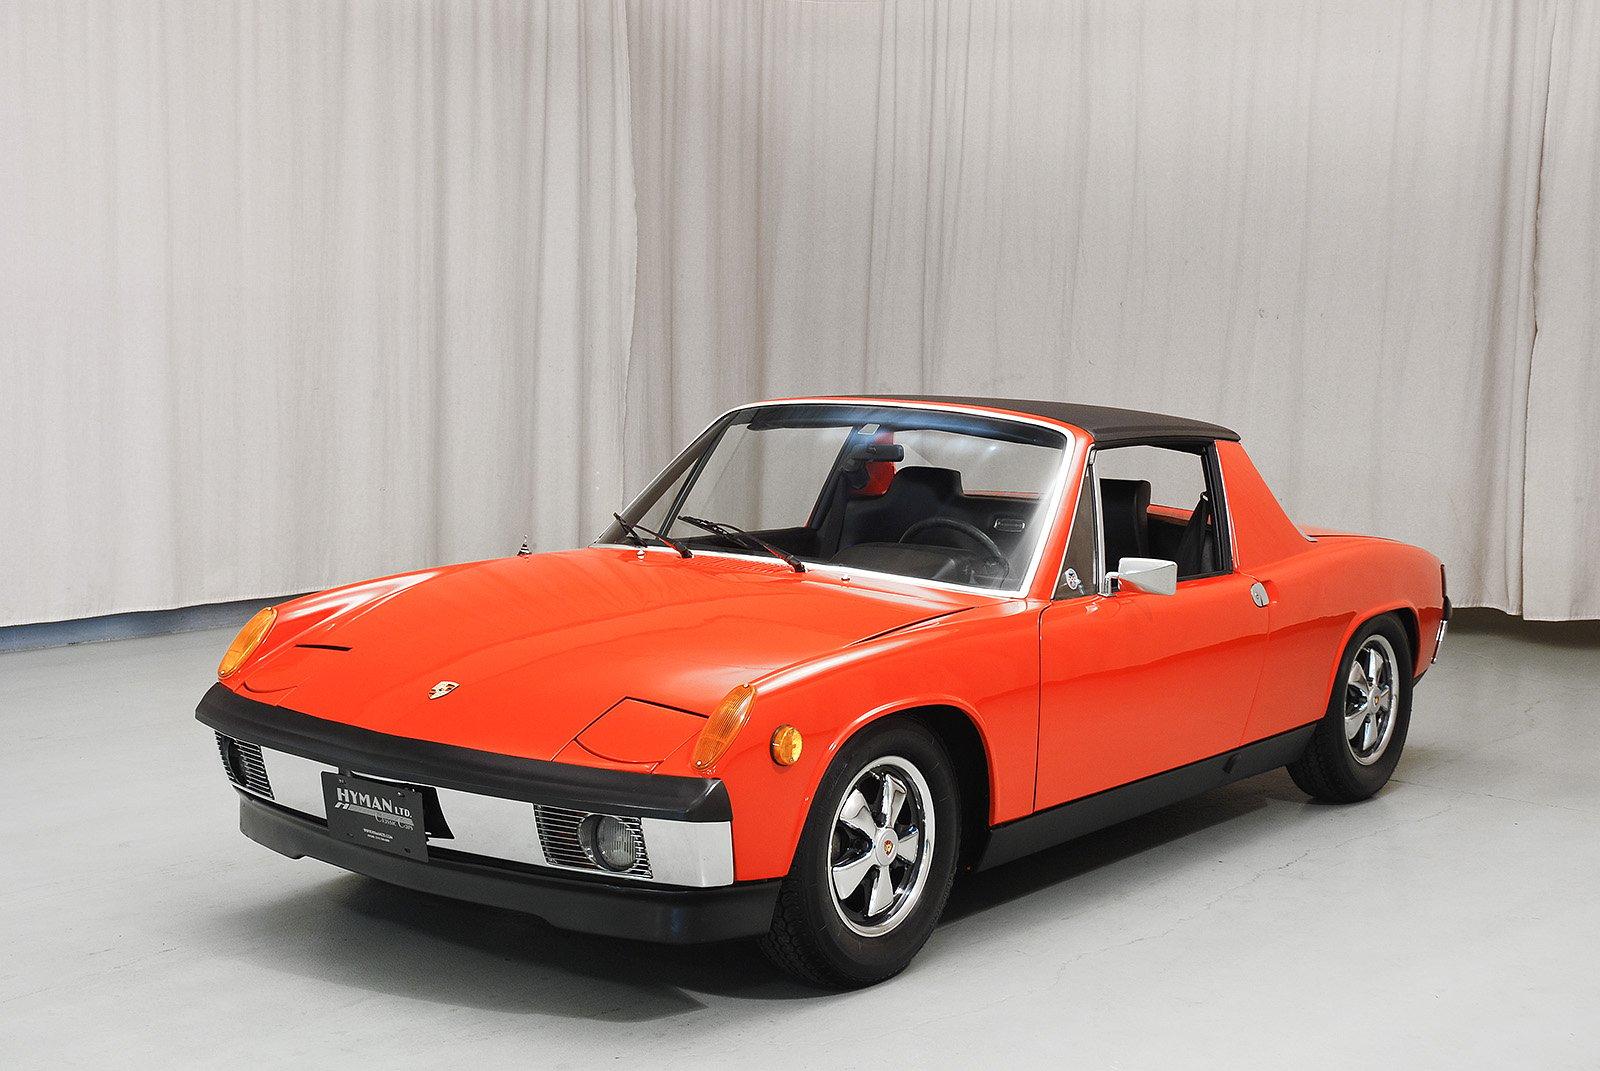 1970 porsche 914 6 targa hyman ltd classic cars. Black Bedroom Furniture Sets. Home Design Ideas